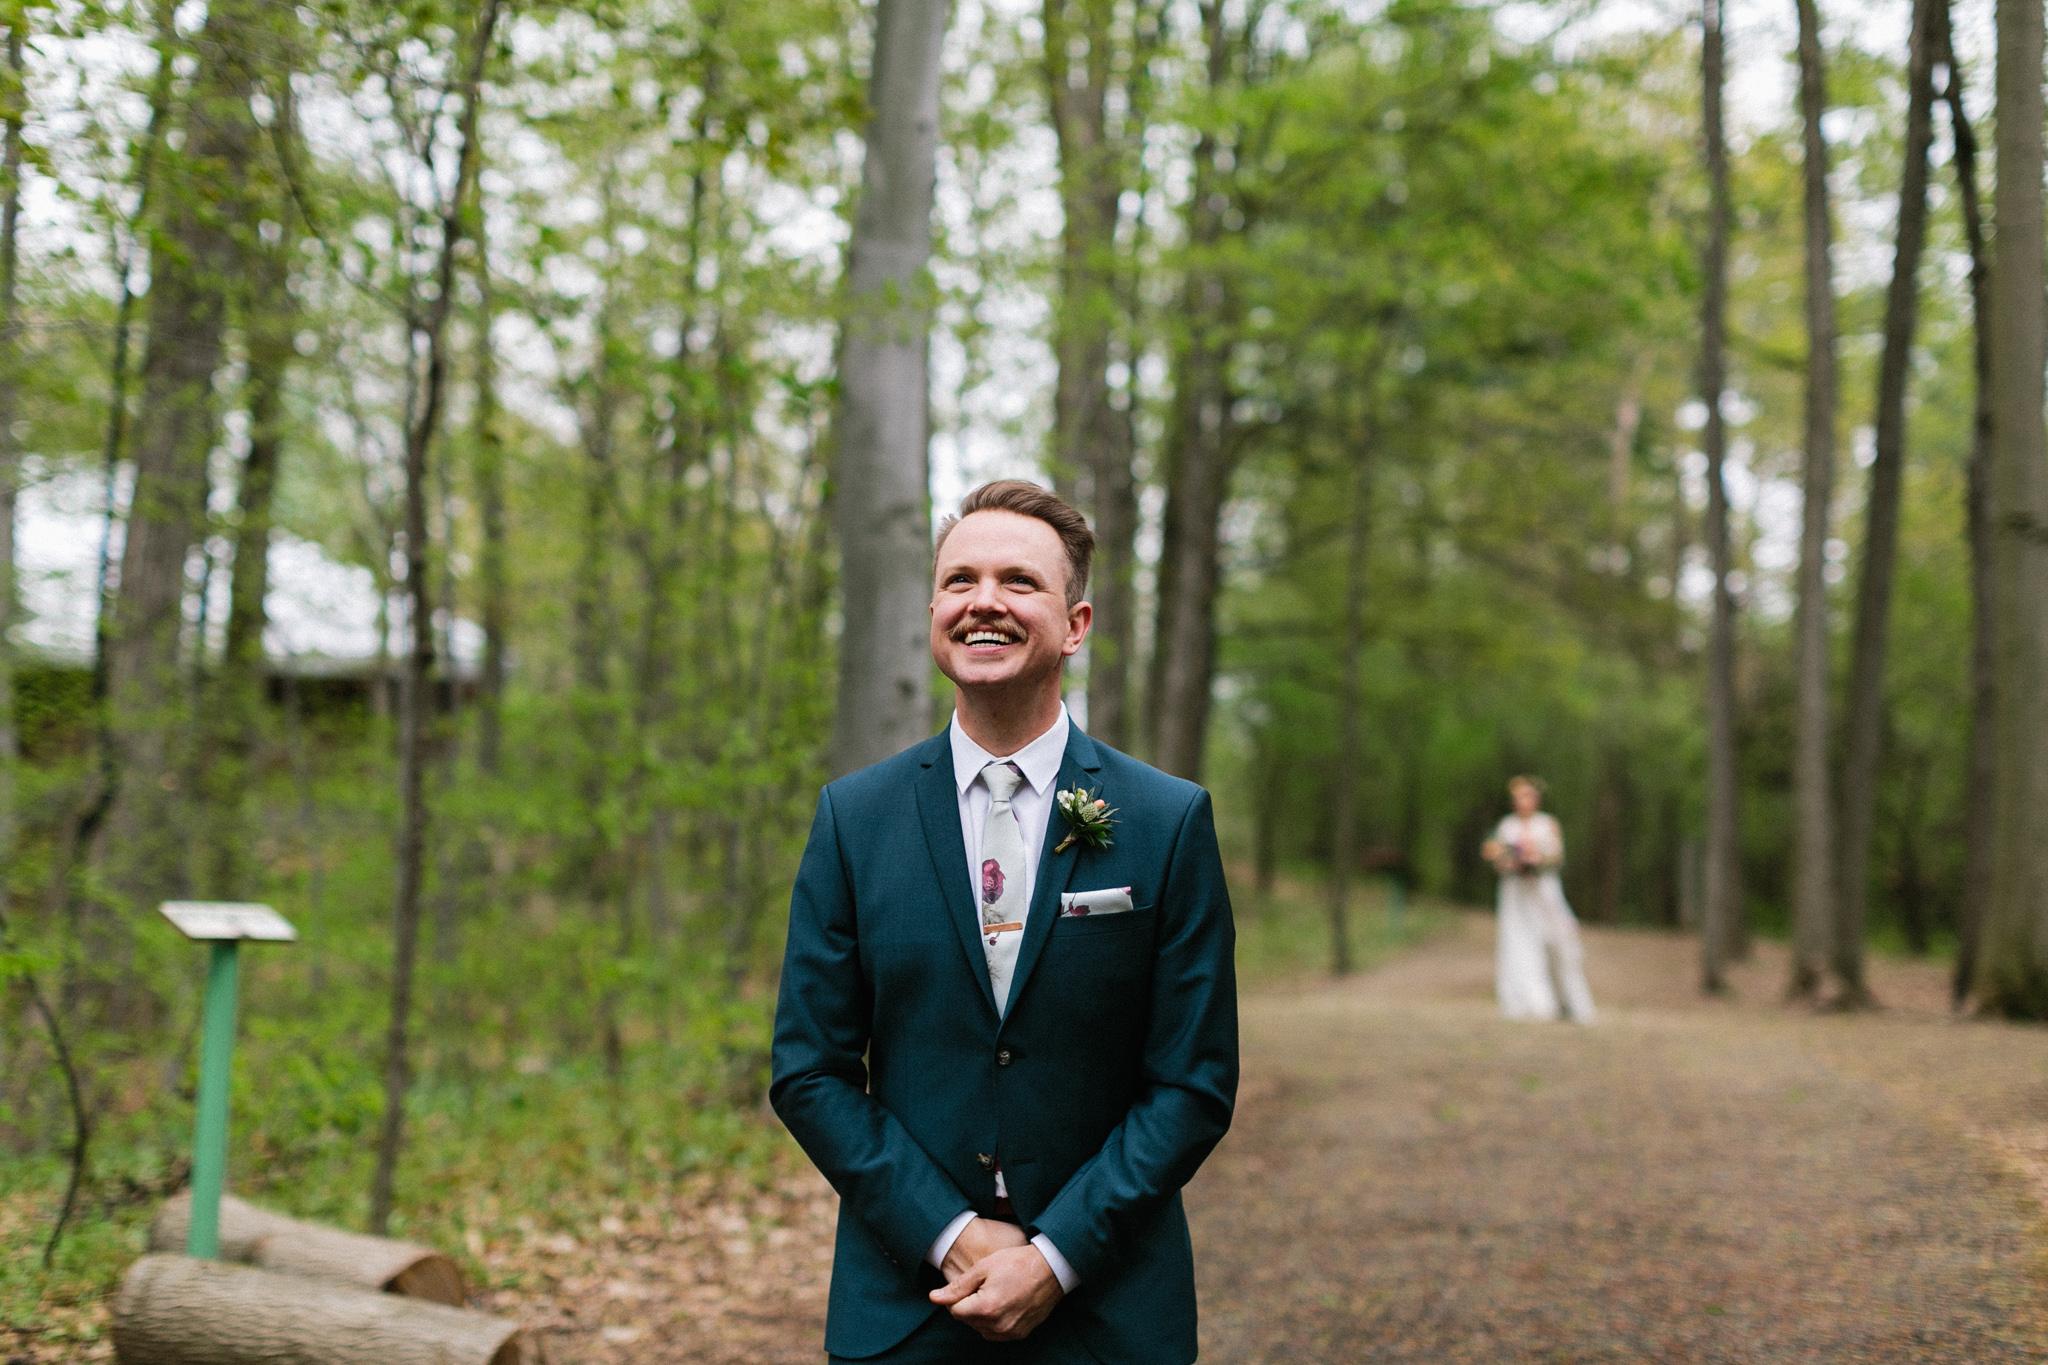 Kortright Centre, Toronto Wedding Photographer, The Junction Toronto, Urban Wedding Toronto, Documentary Photography, candid wedding photos, calgary wedding photographer, phoenix wedding photographer, goodyear arizona